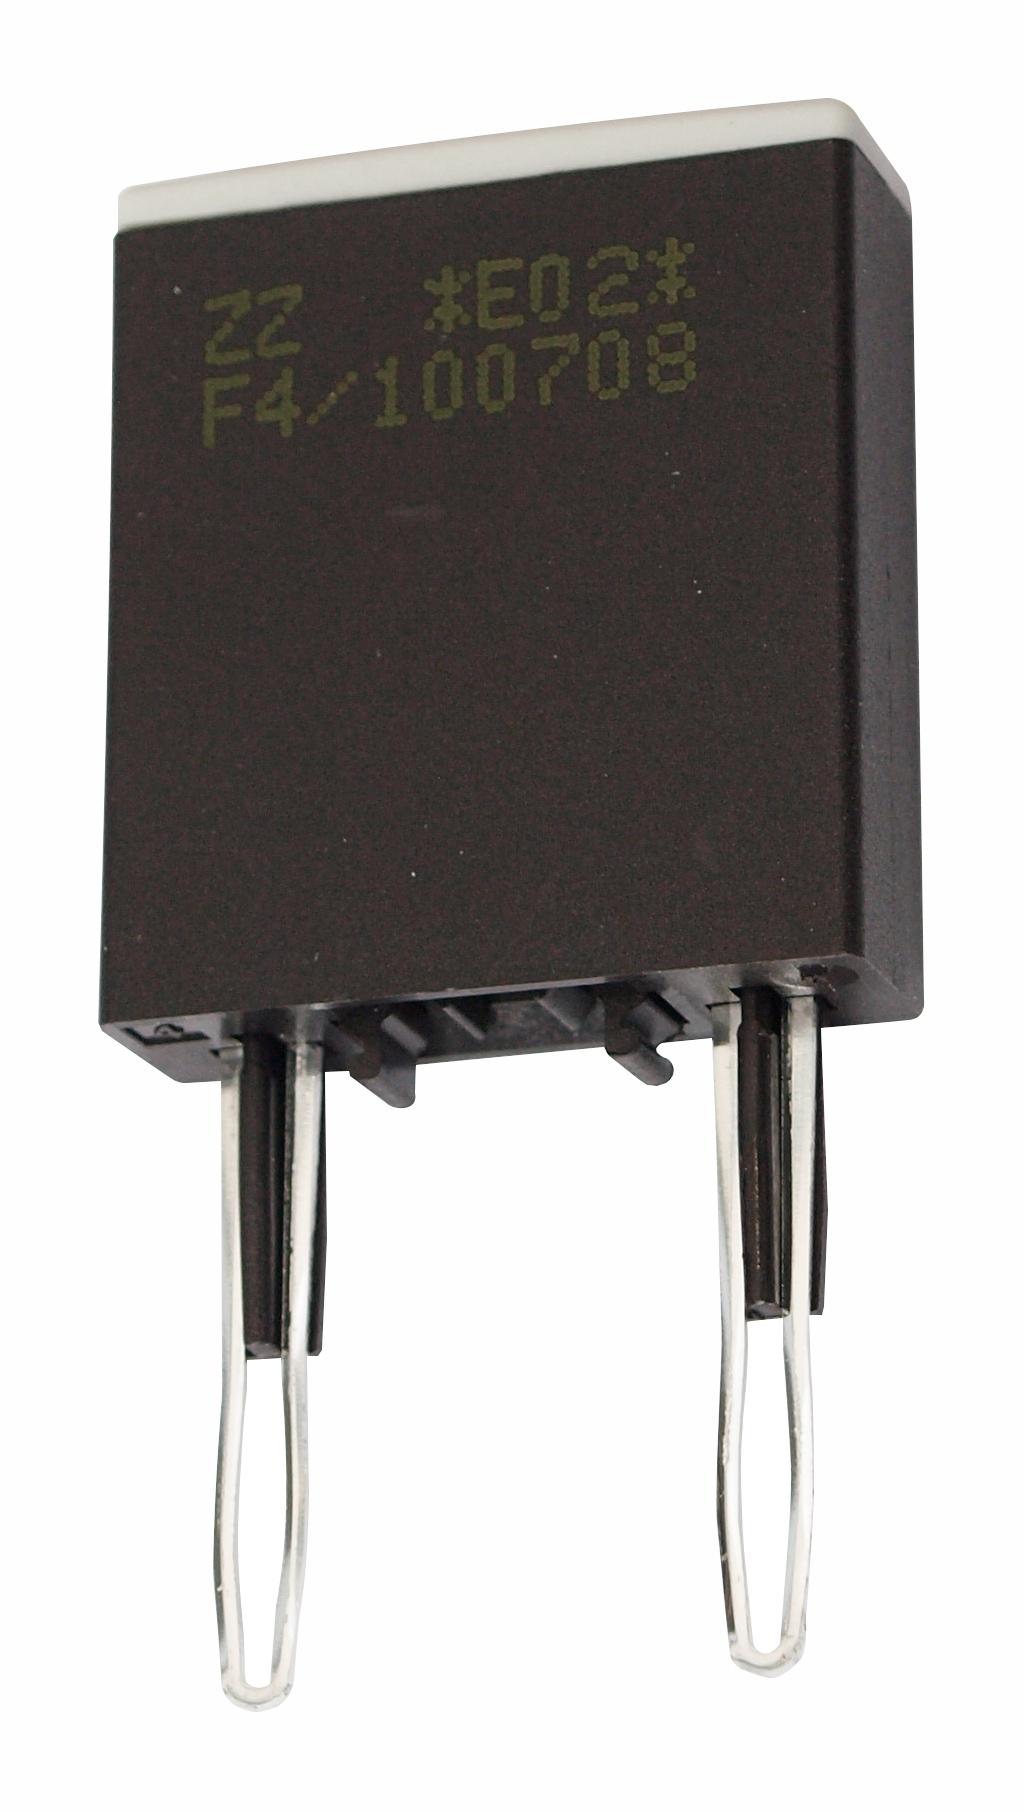 1 Stk Entstördiode DC12-250V, 00 LSZD0004--